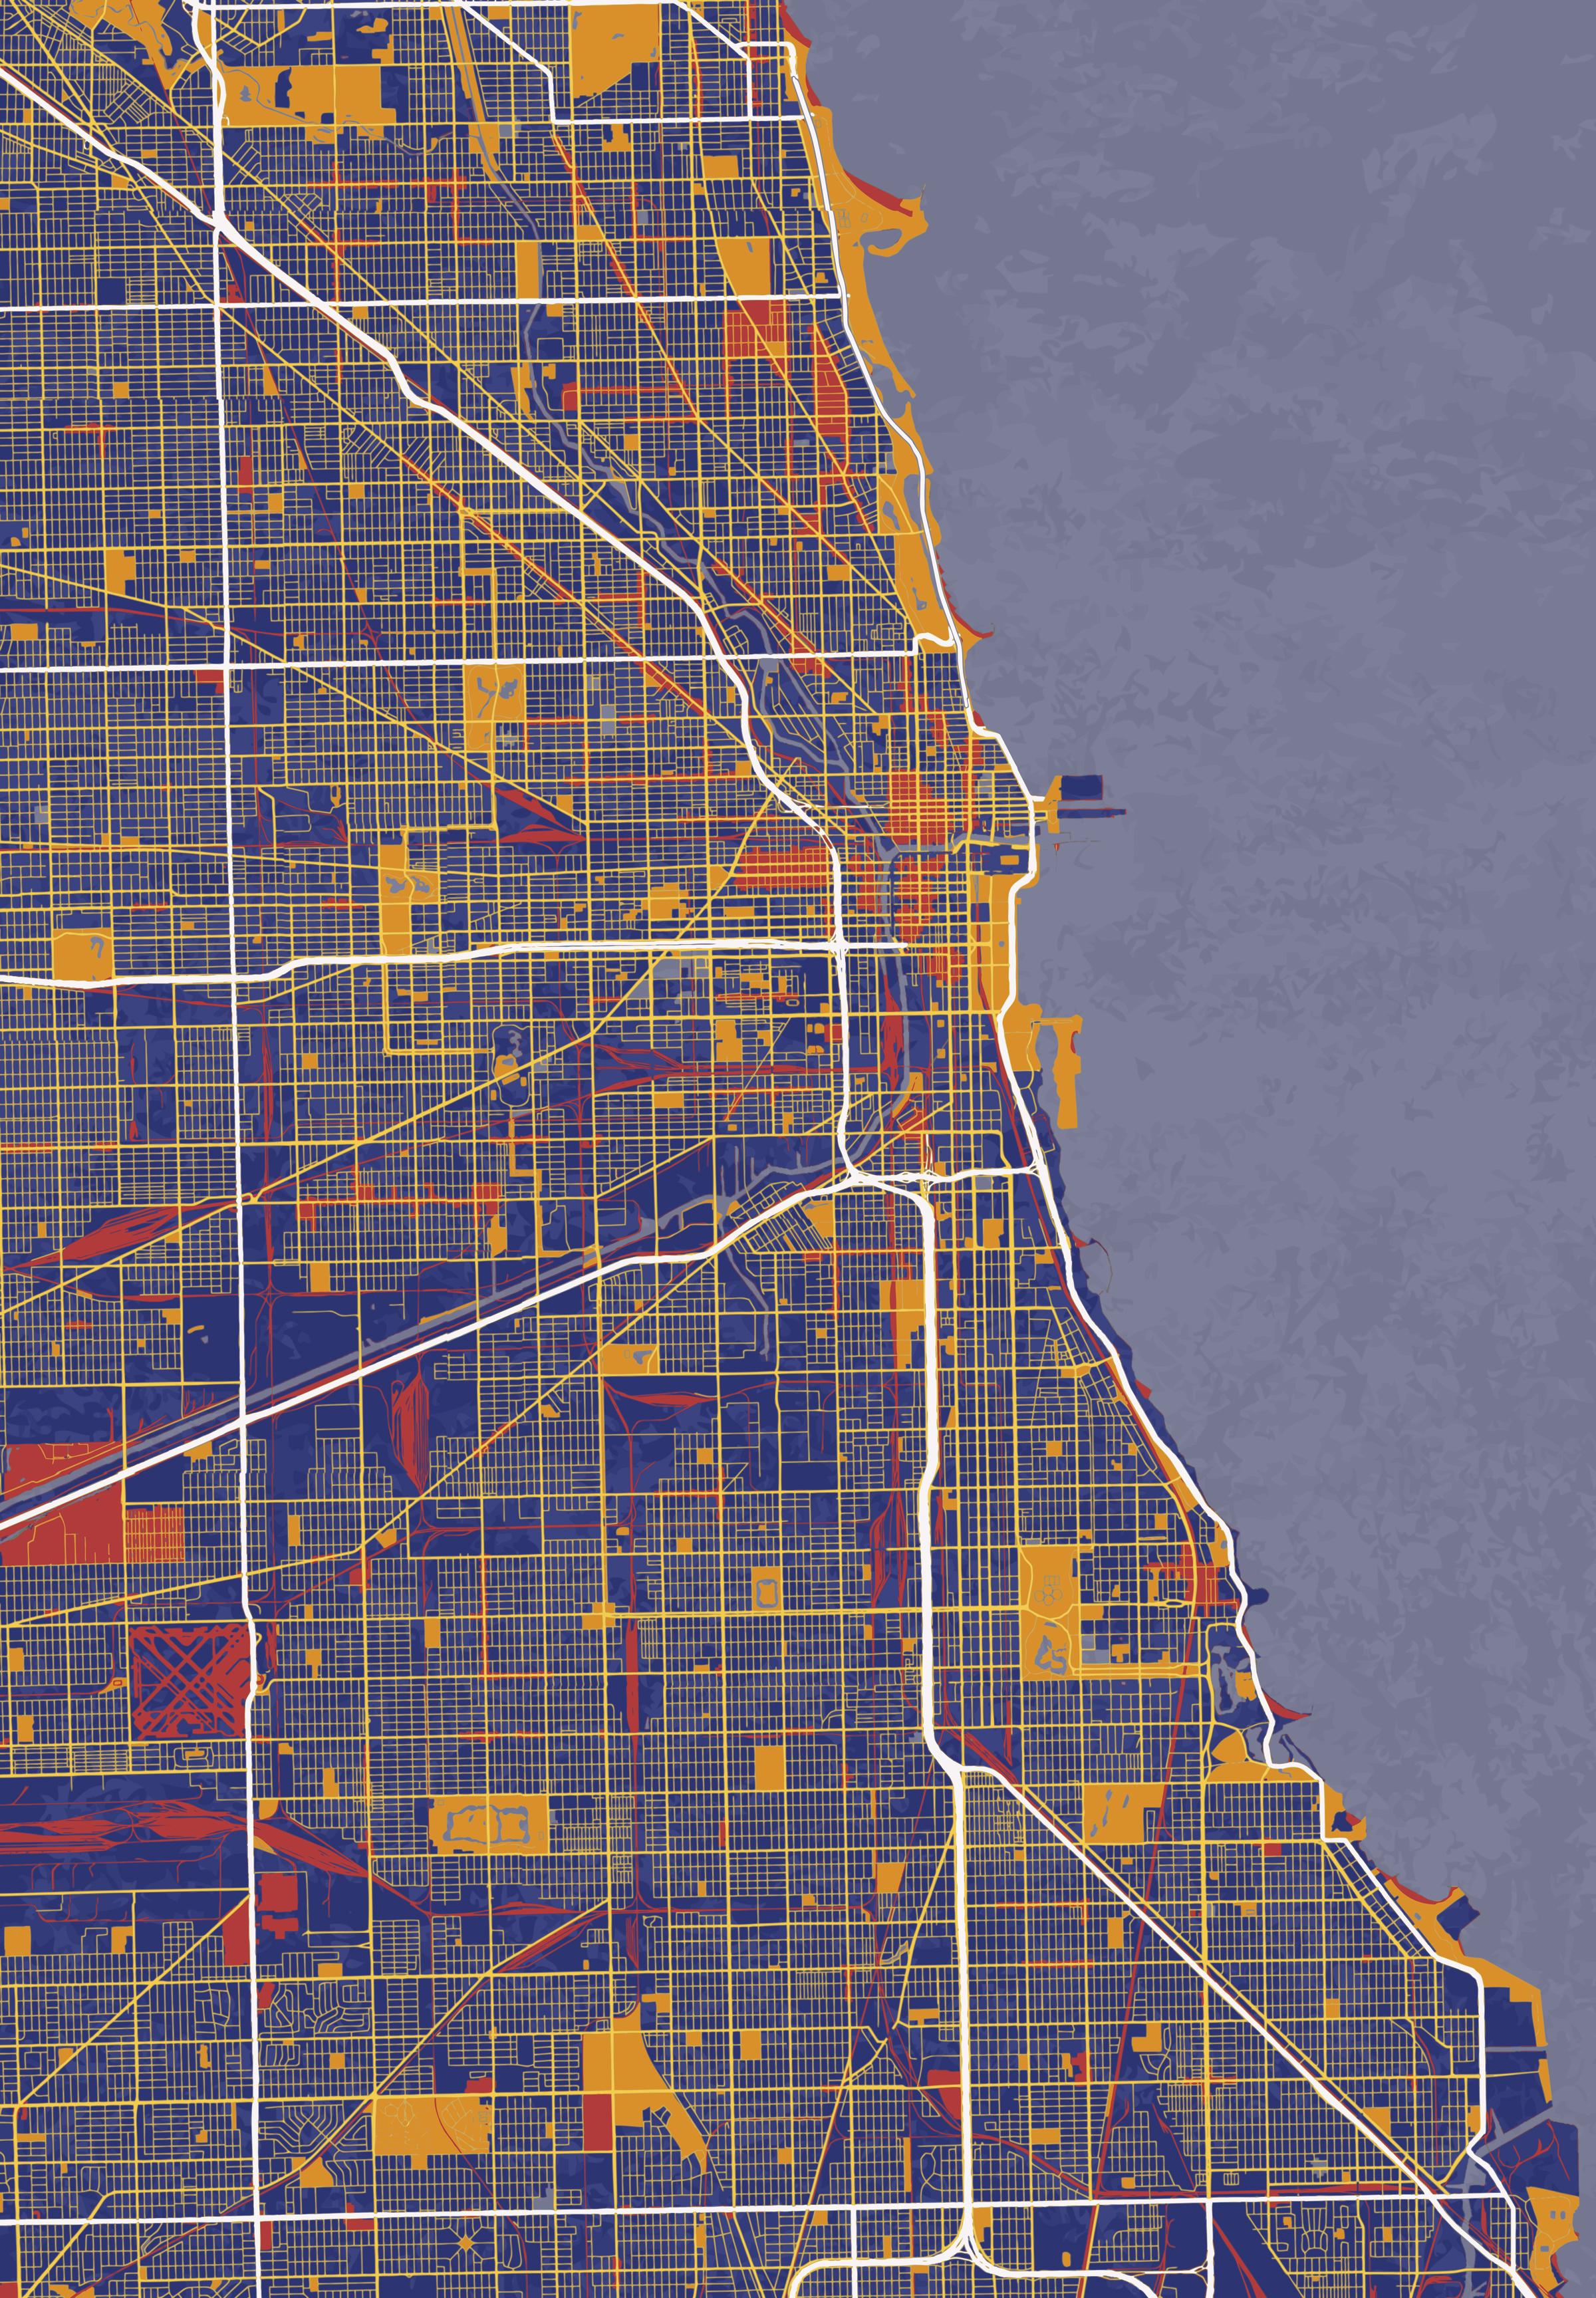 Chicago, Illinois, 2018